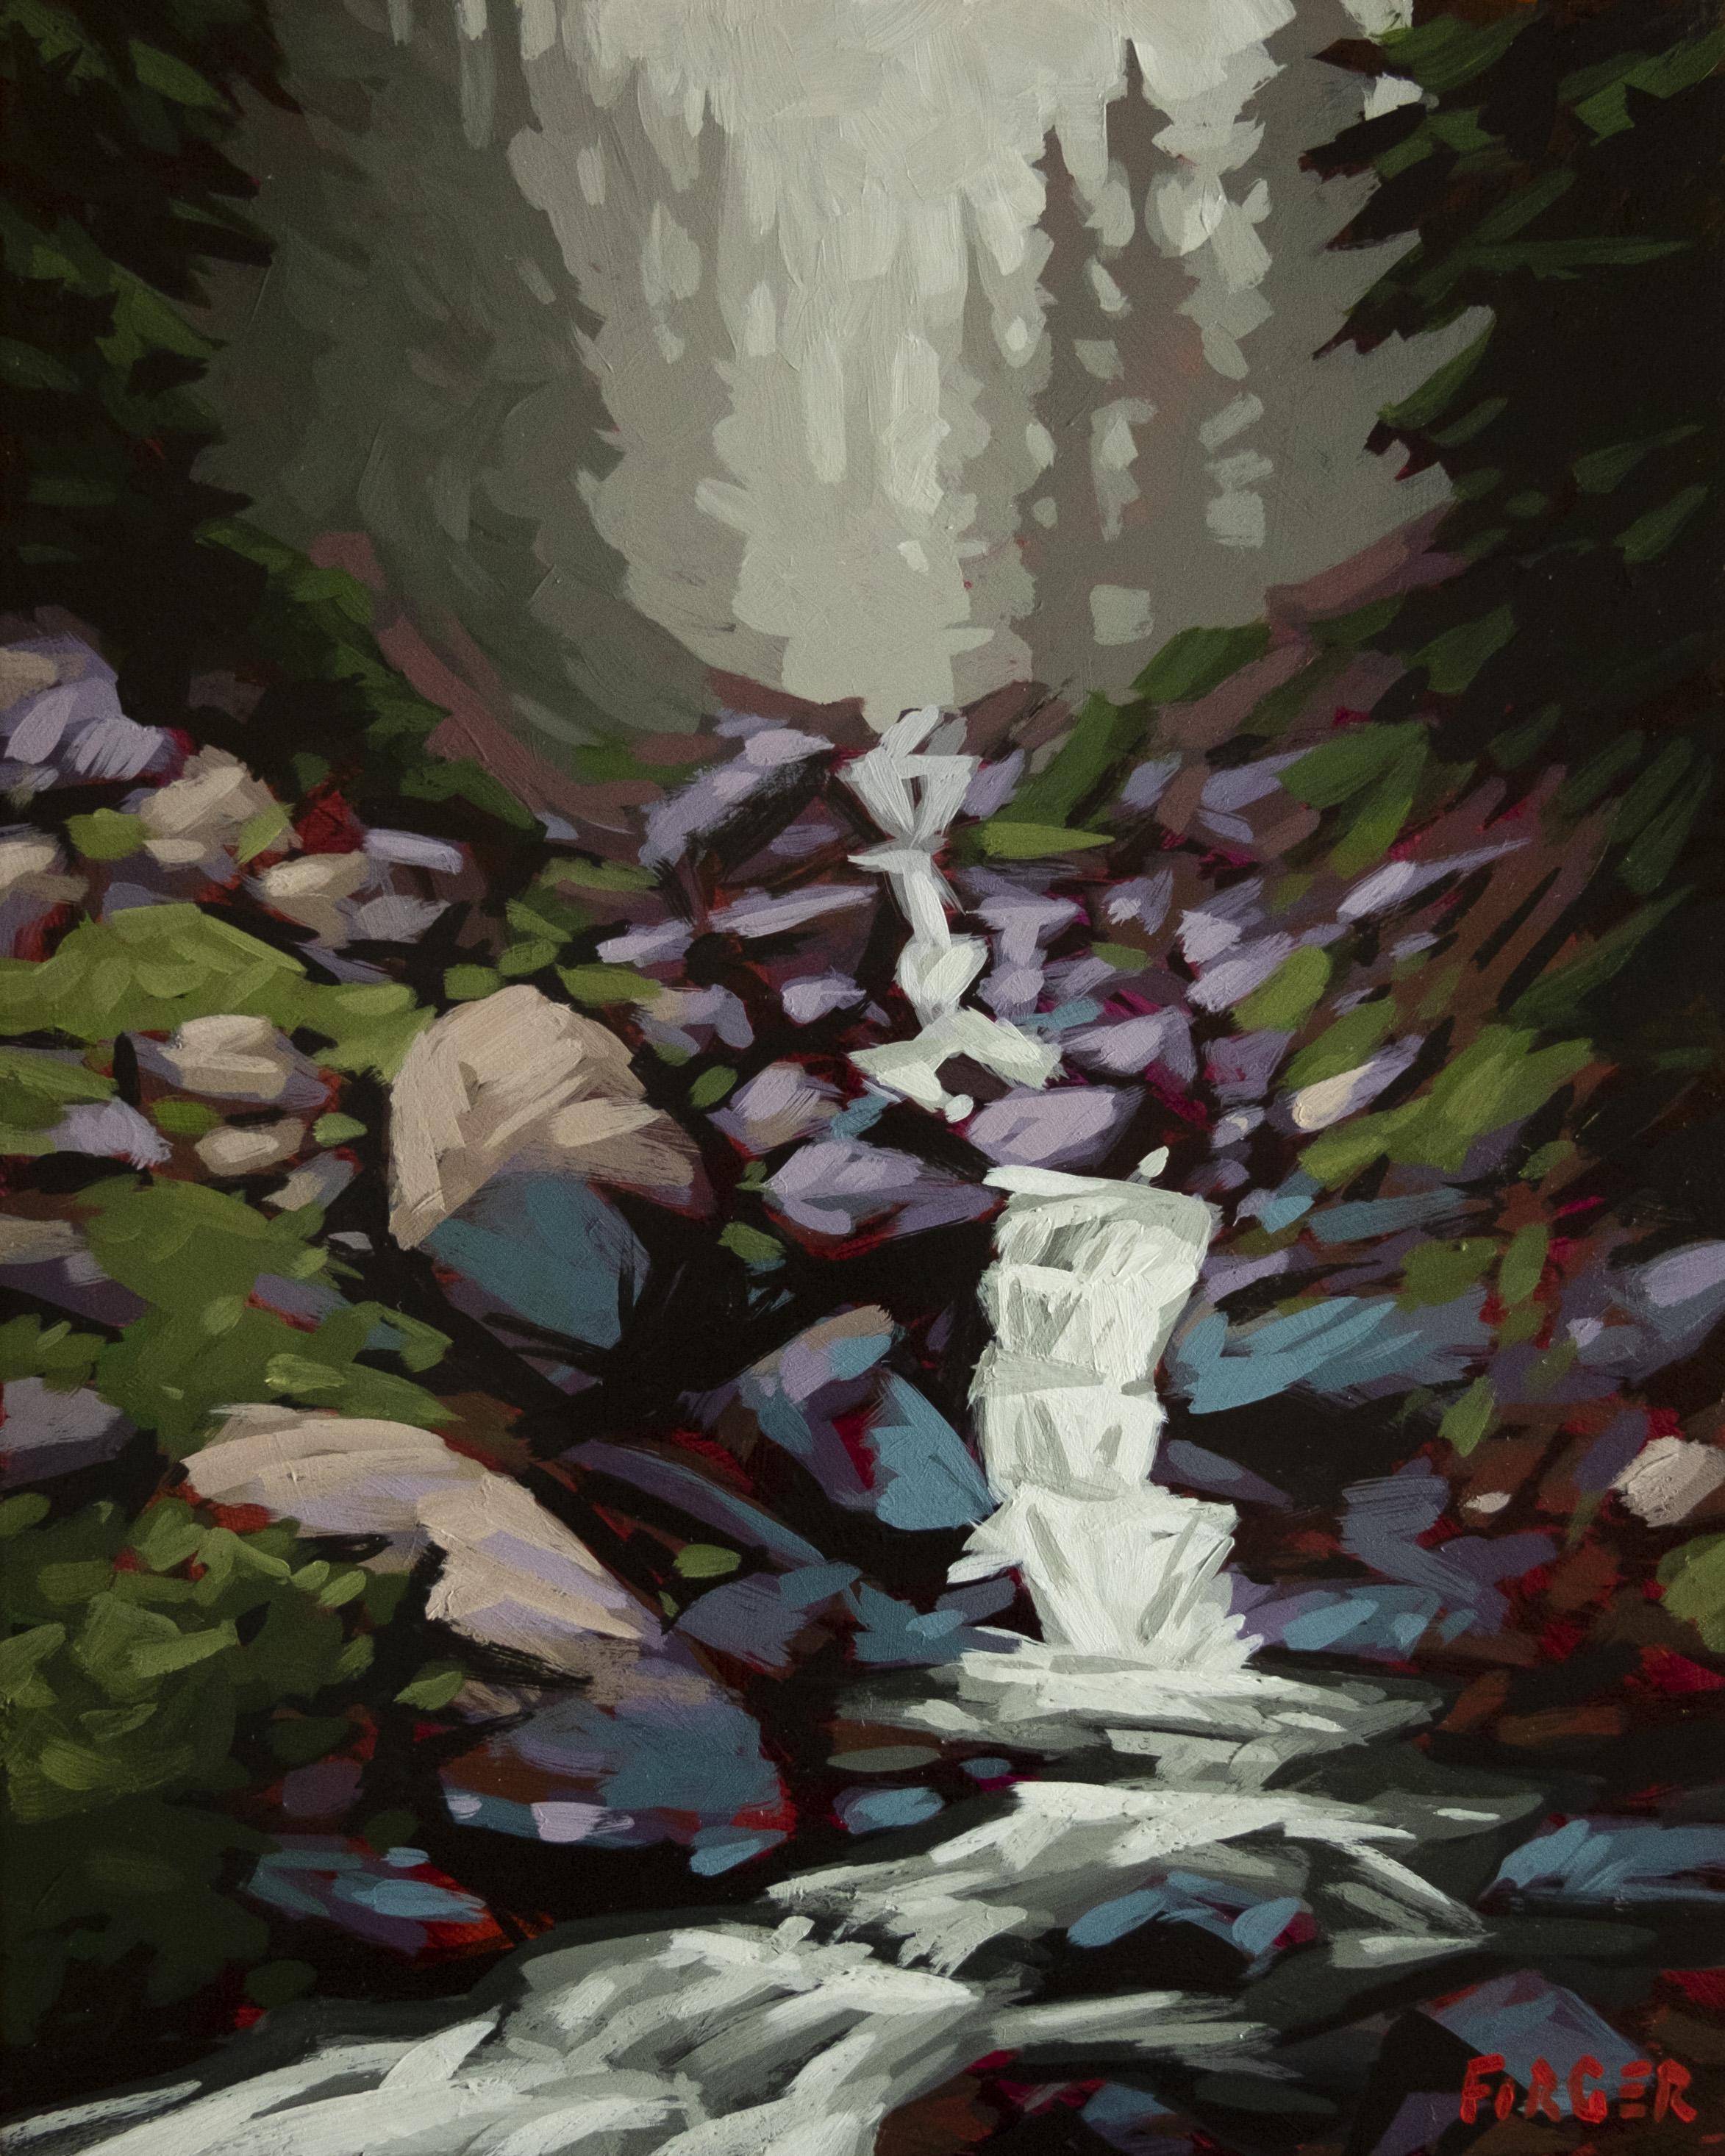 Falling Water - 8 x 10, Acrylic on Panel